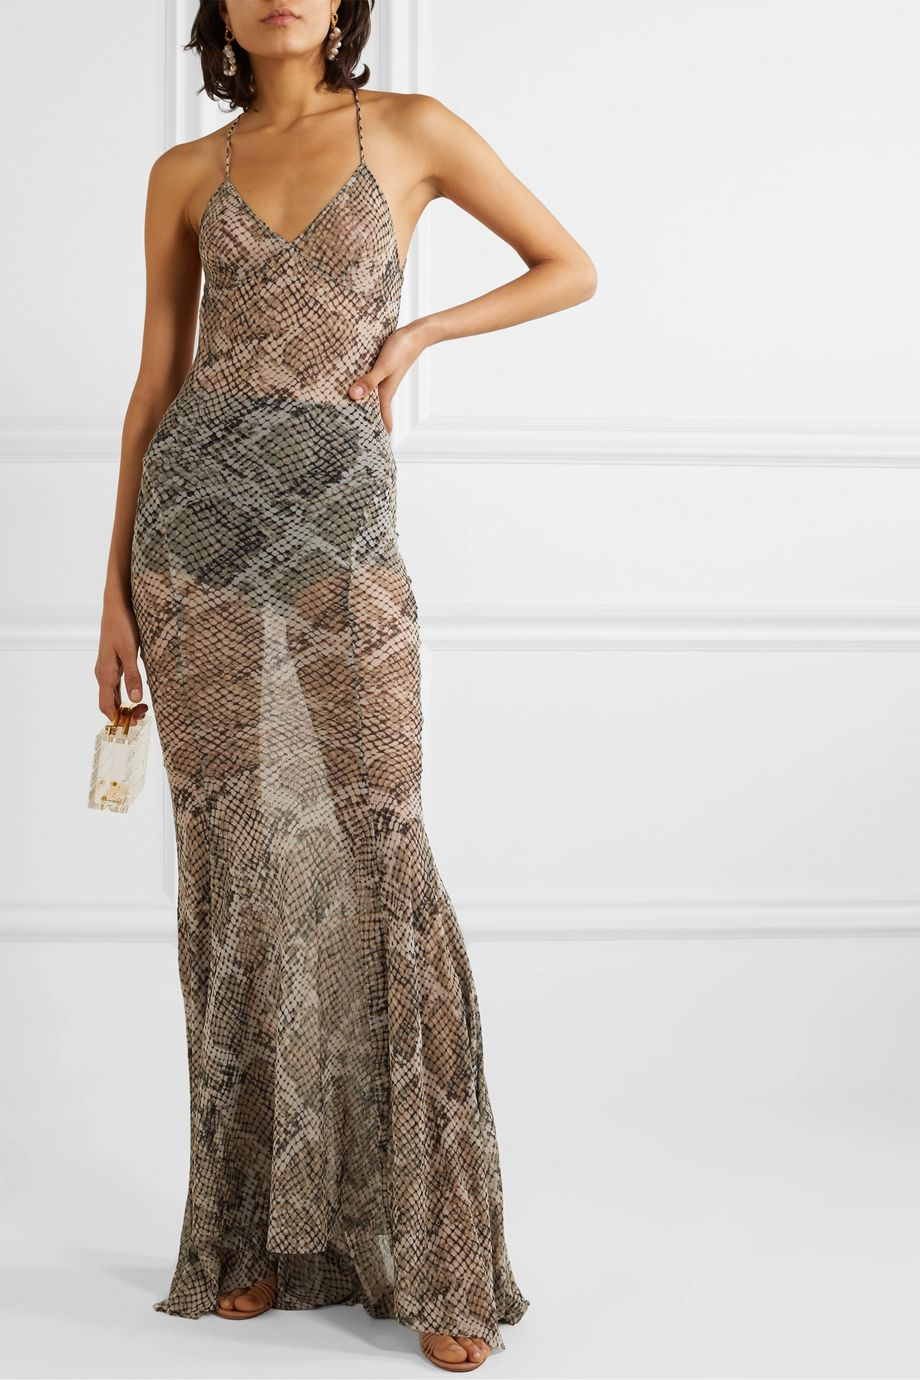 Norma Kamali Open-back snake-print stretch-gauze maxi dress